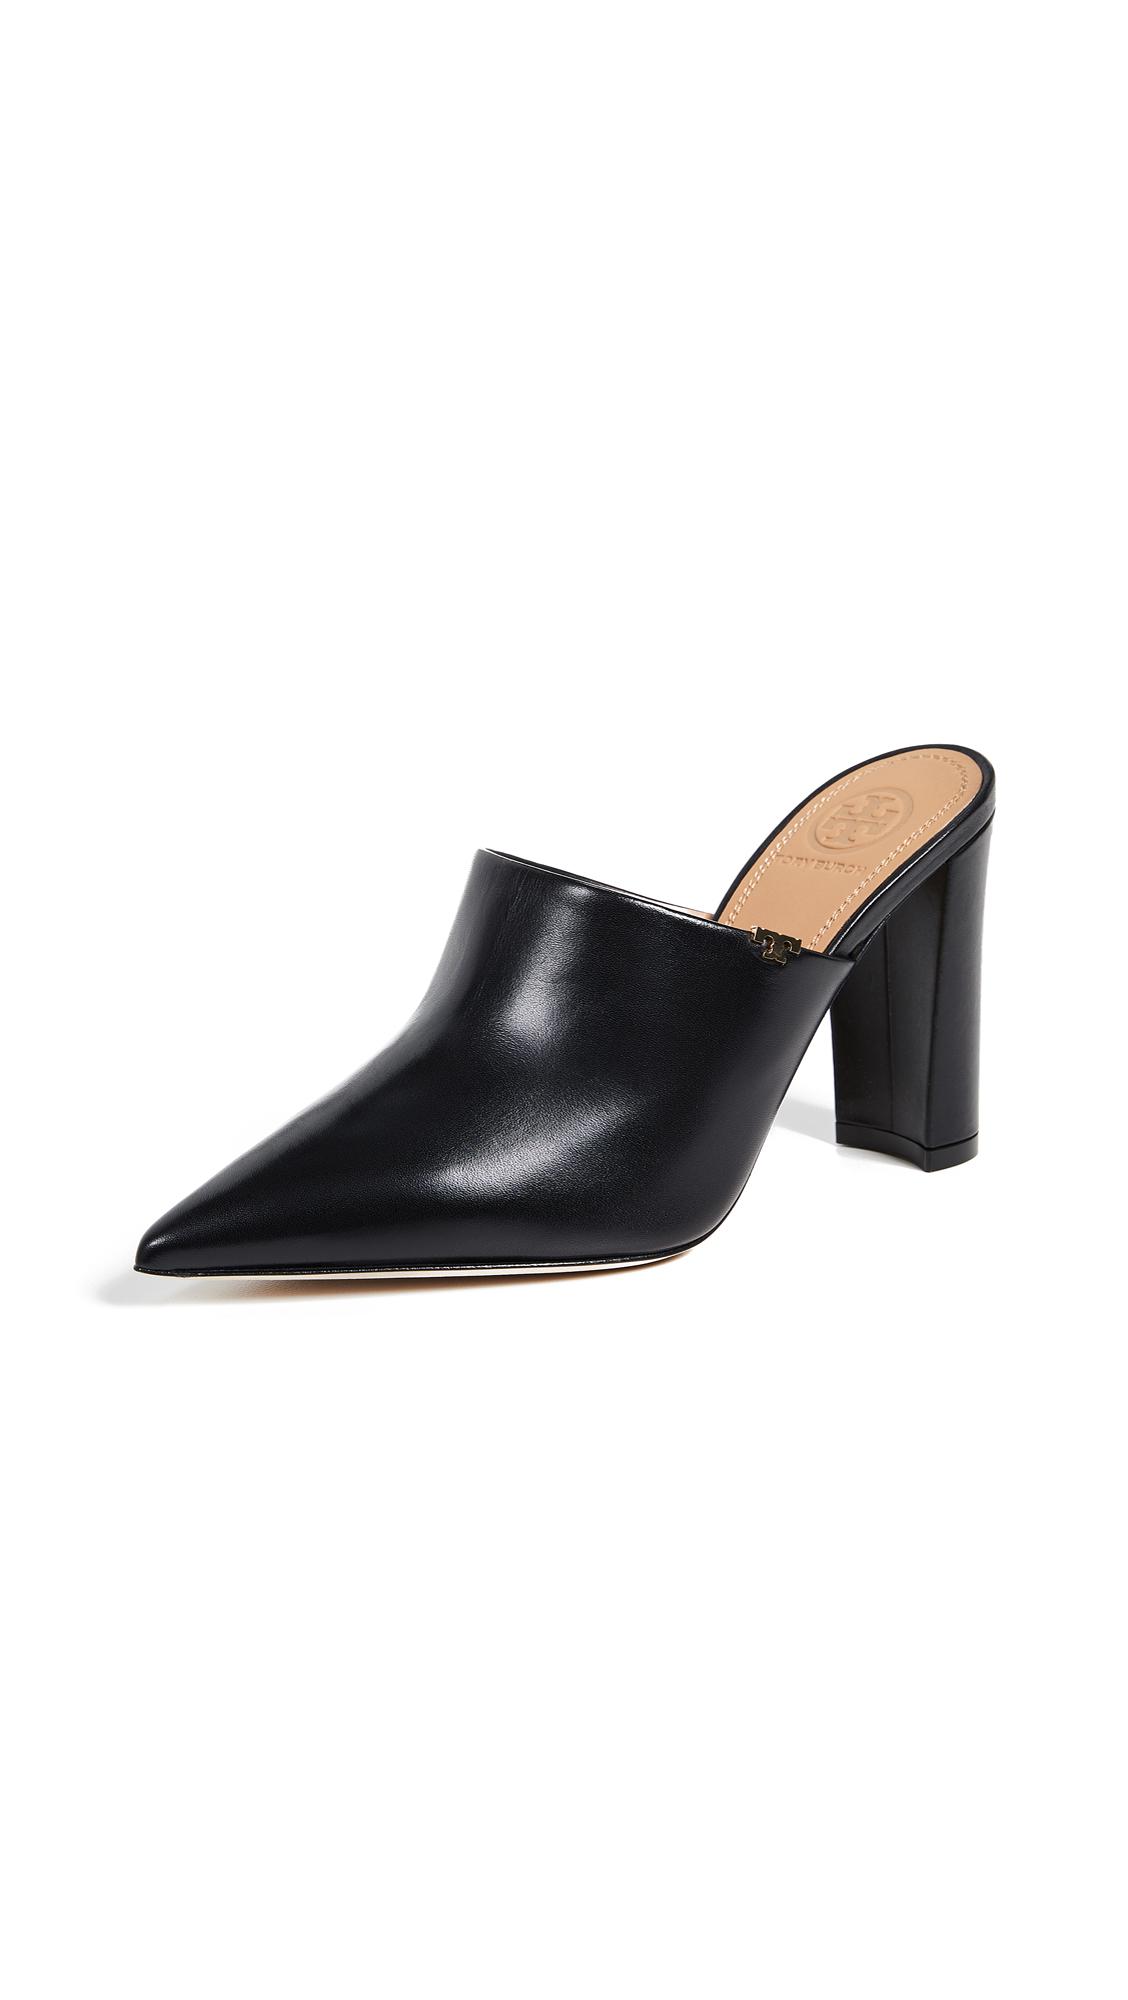 Tory Burch Penelope 90mm Mules - Perfect Black